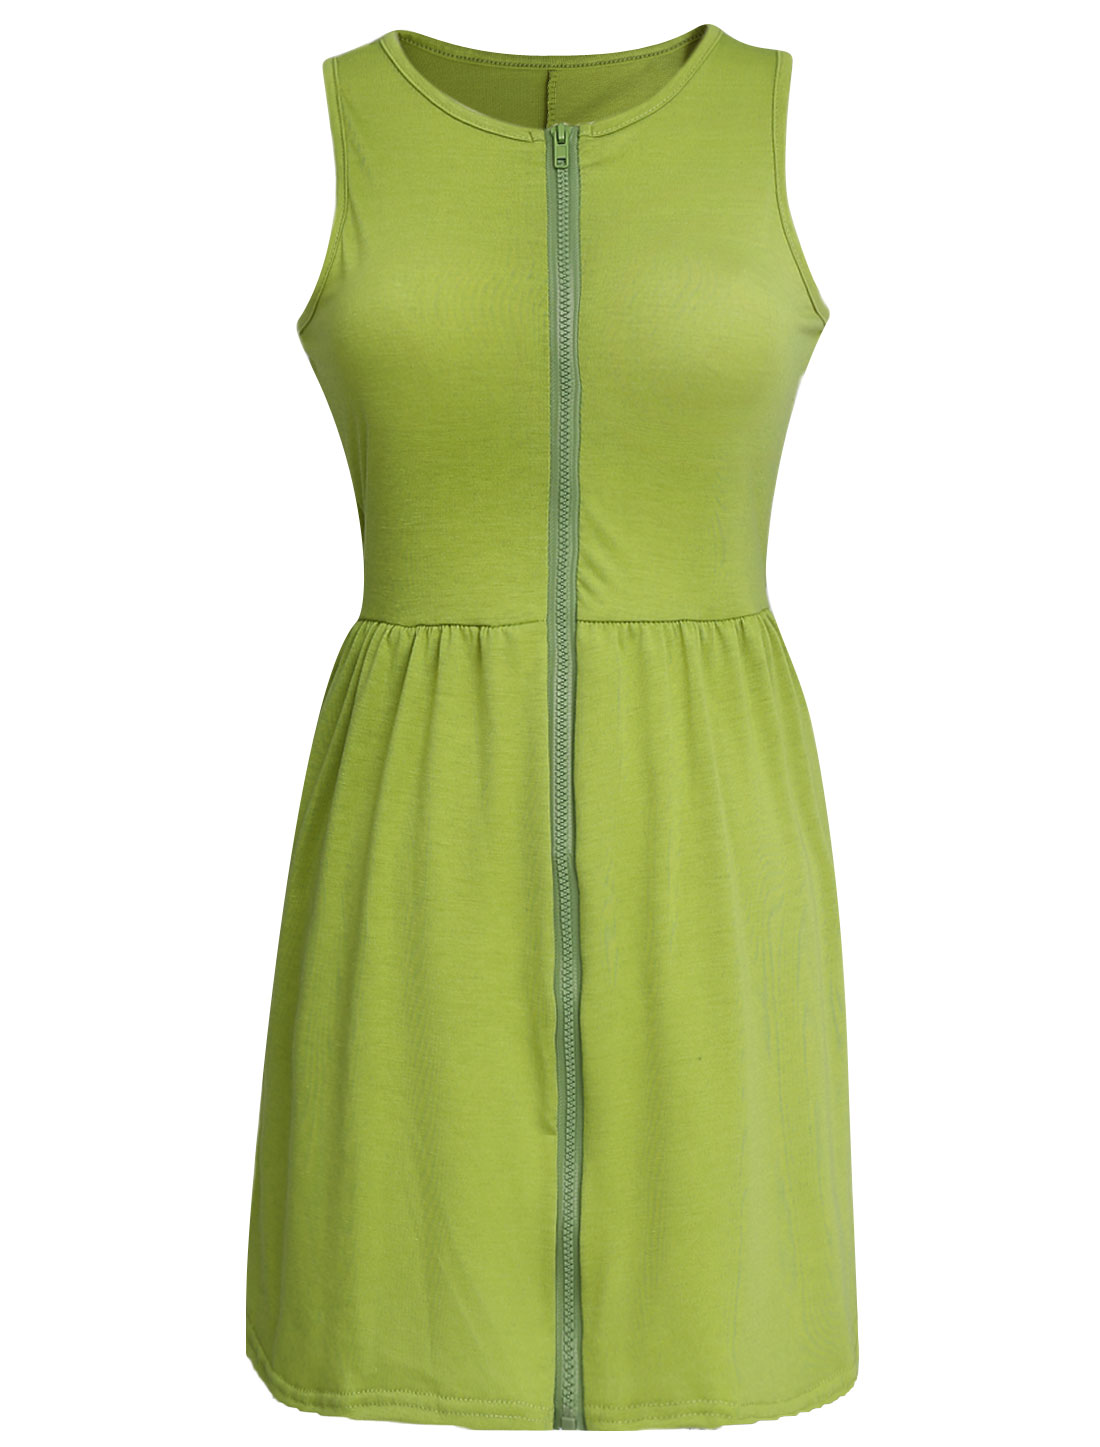 Lady Sleeveless Zip-Front Double Side Pockets Shirt Dress Moss Green XS